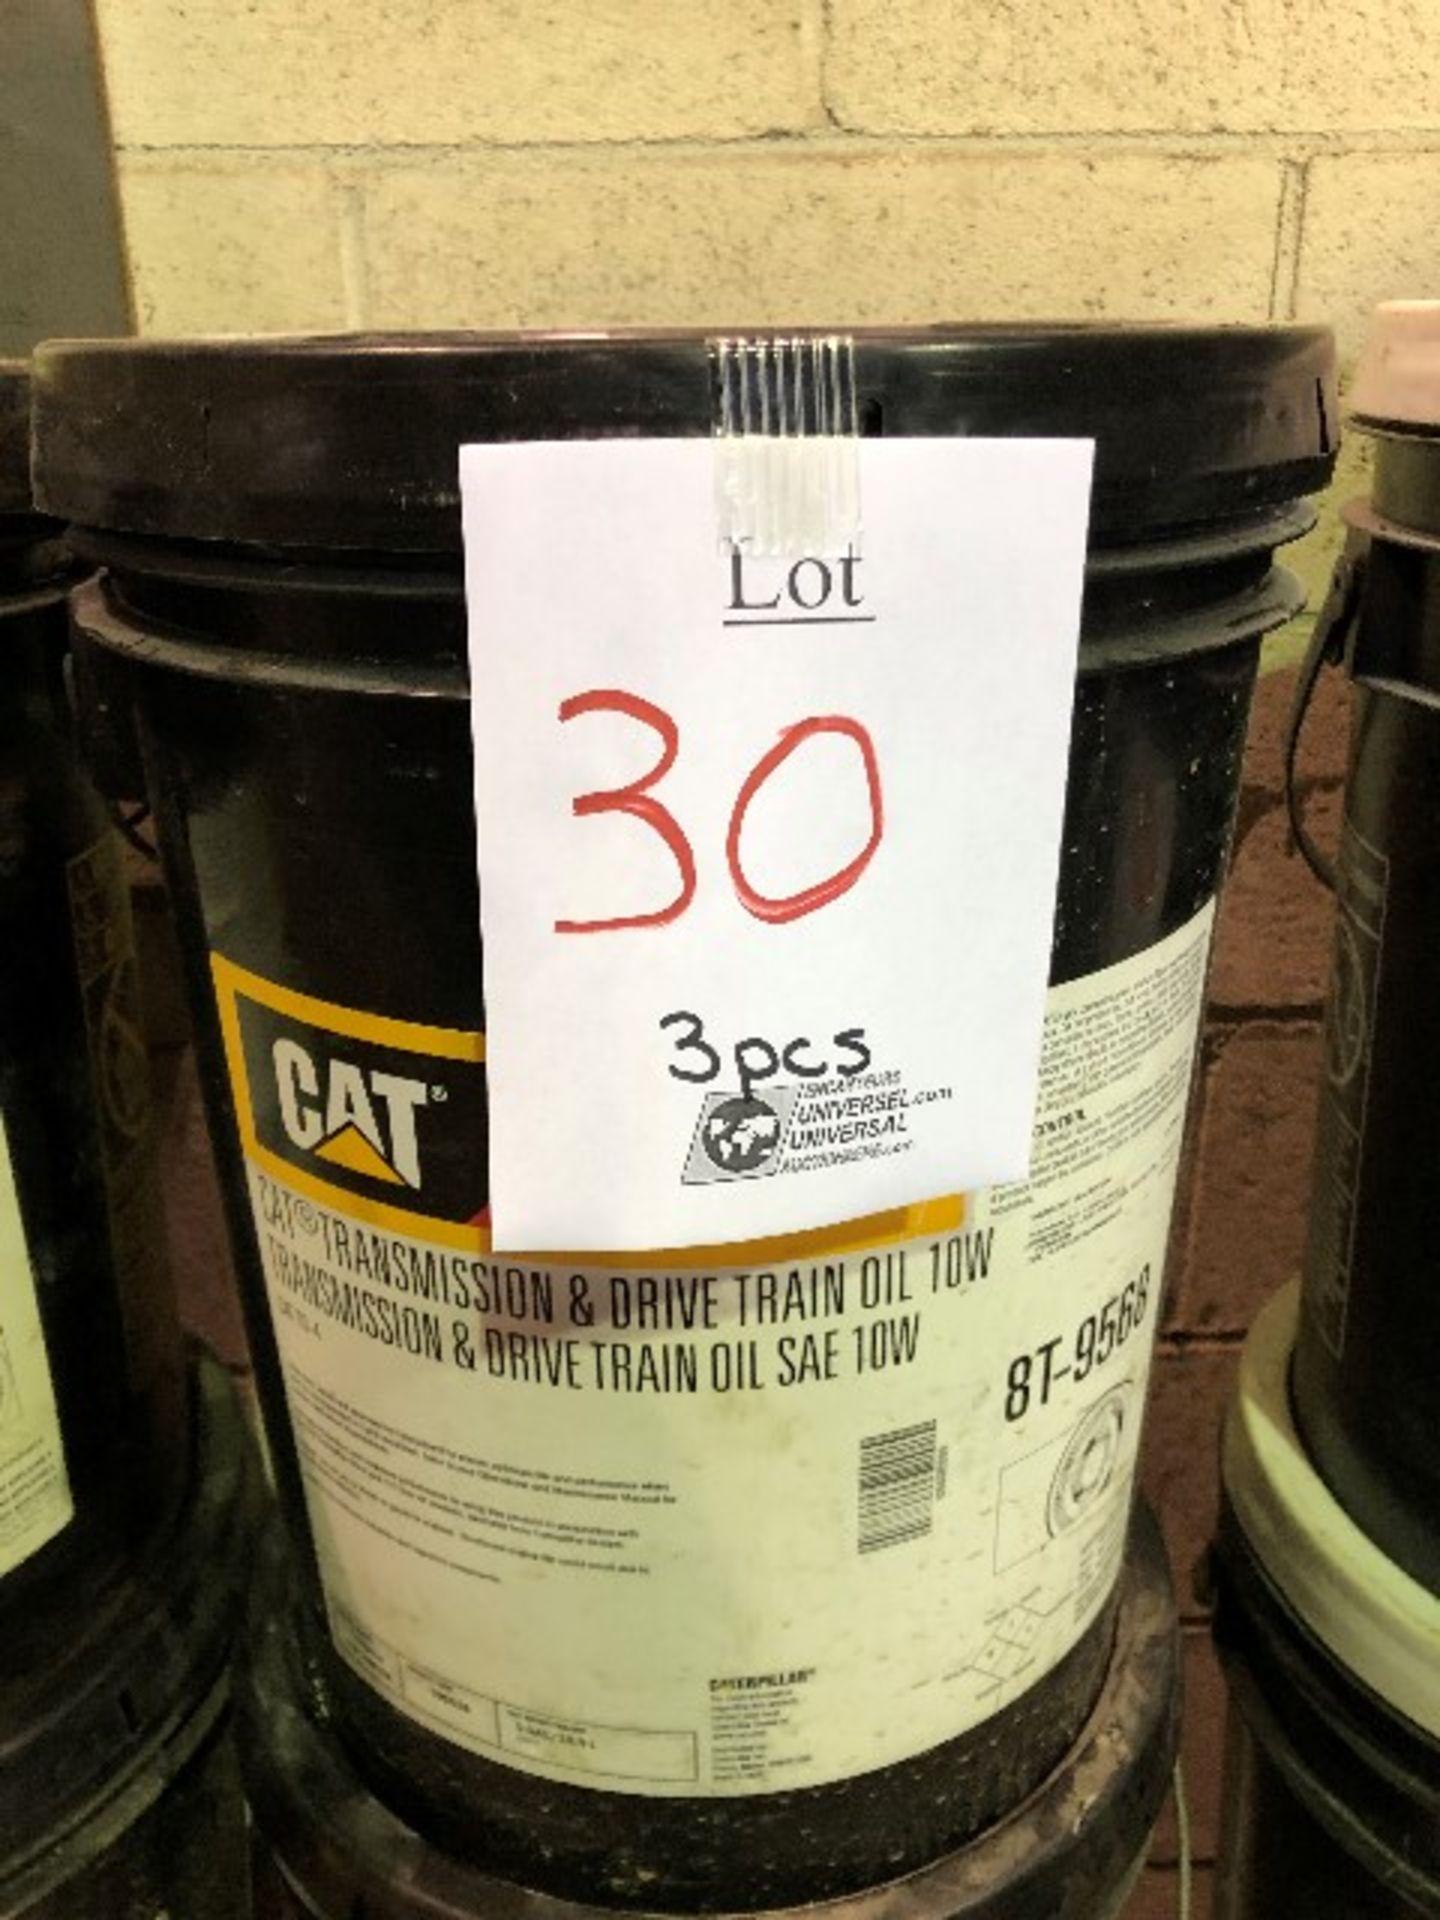 CAT Transmission & drive train oil, SAE 10W, 3 pails - Image 2 of 2